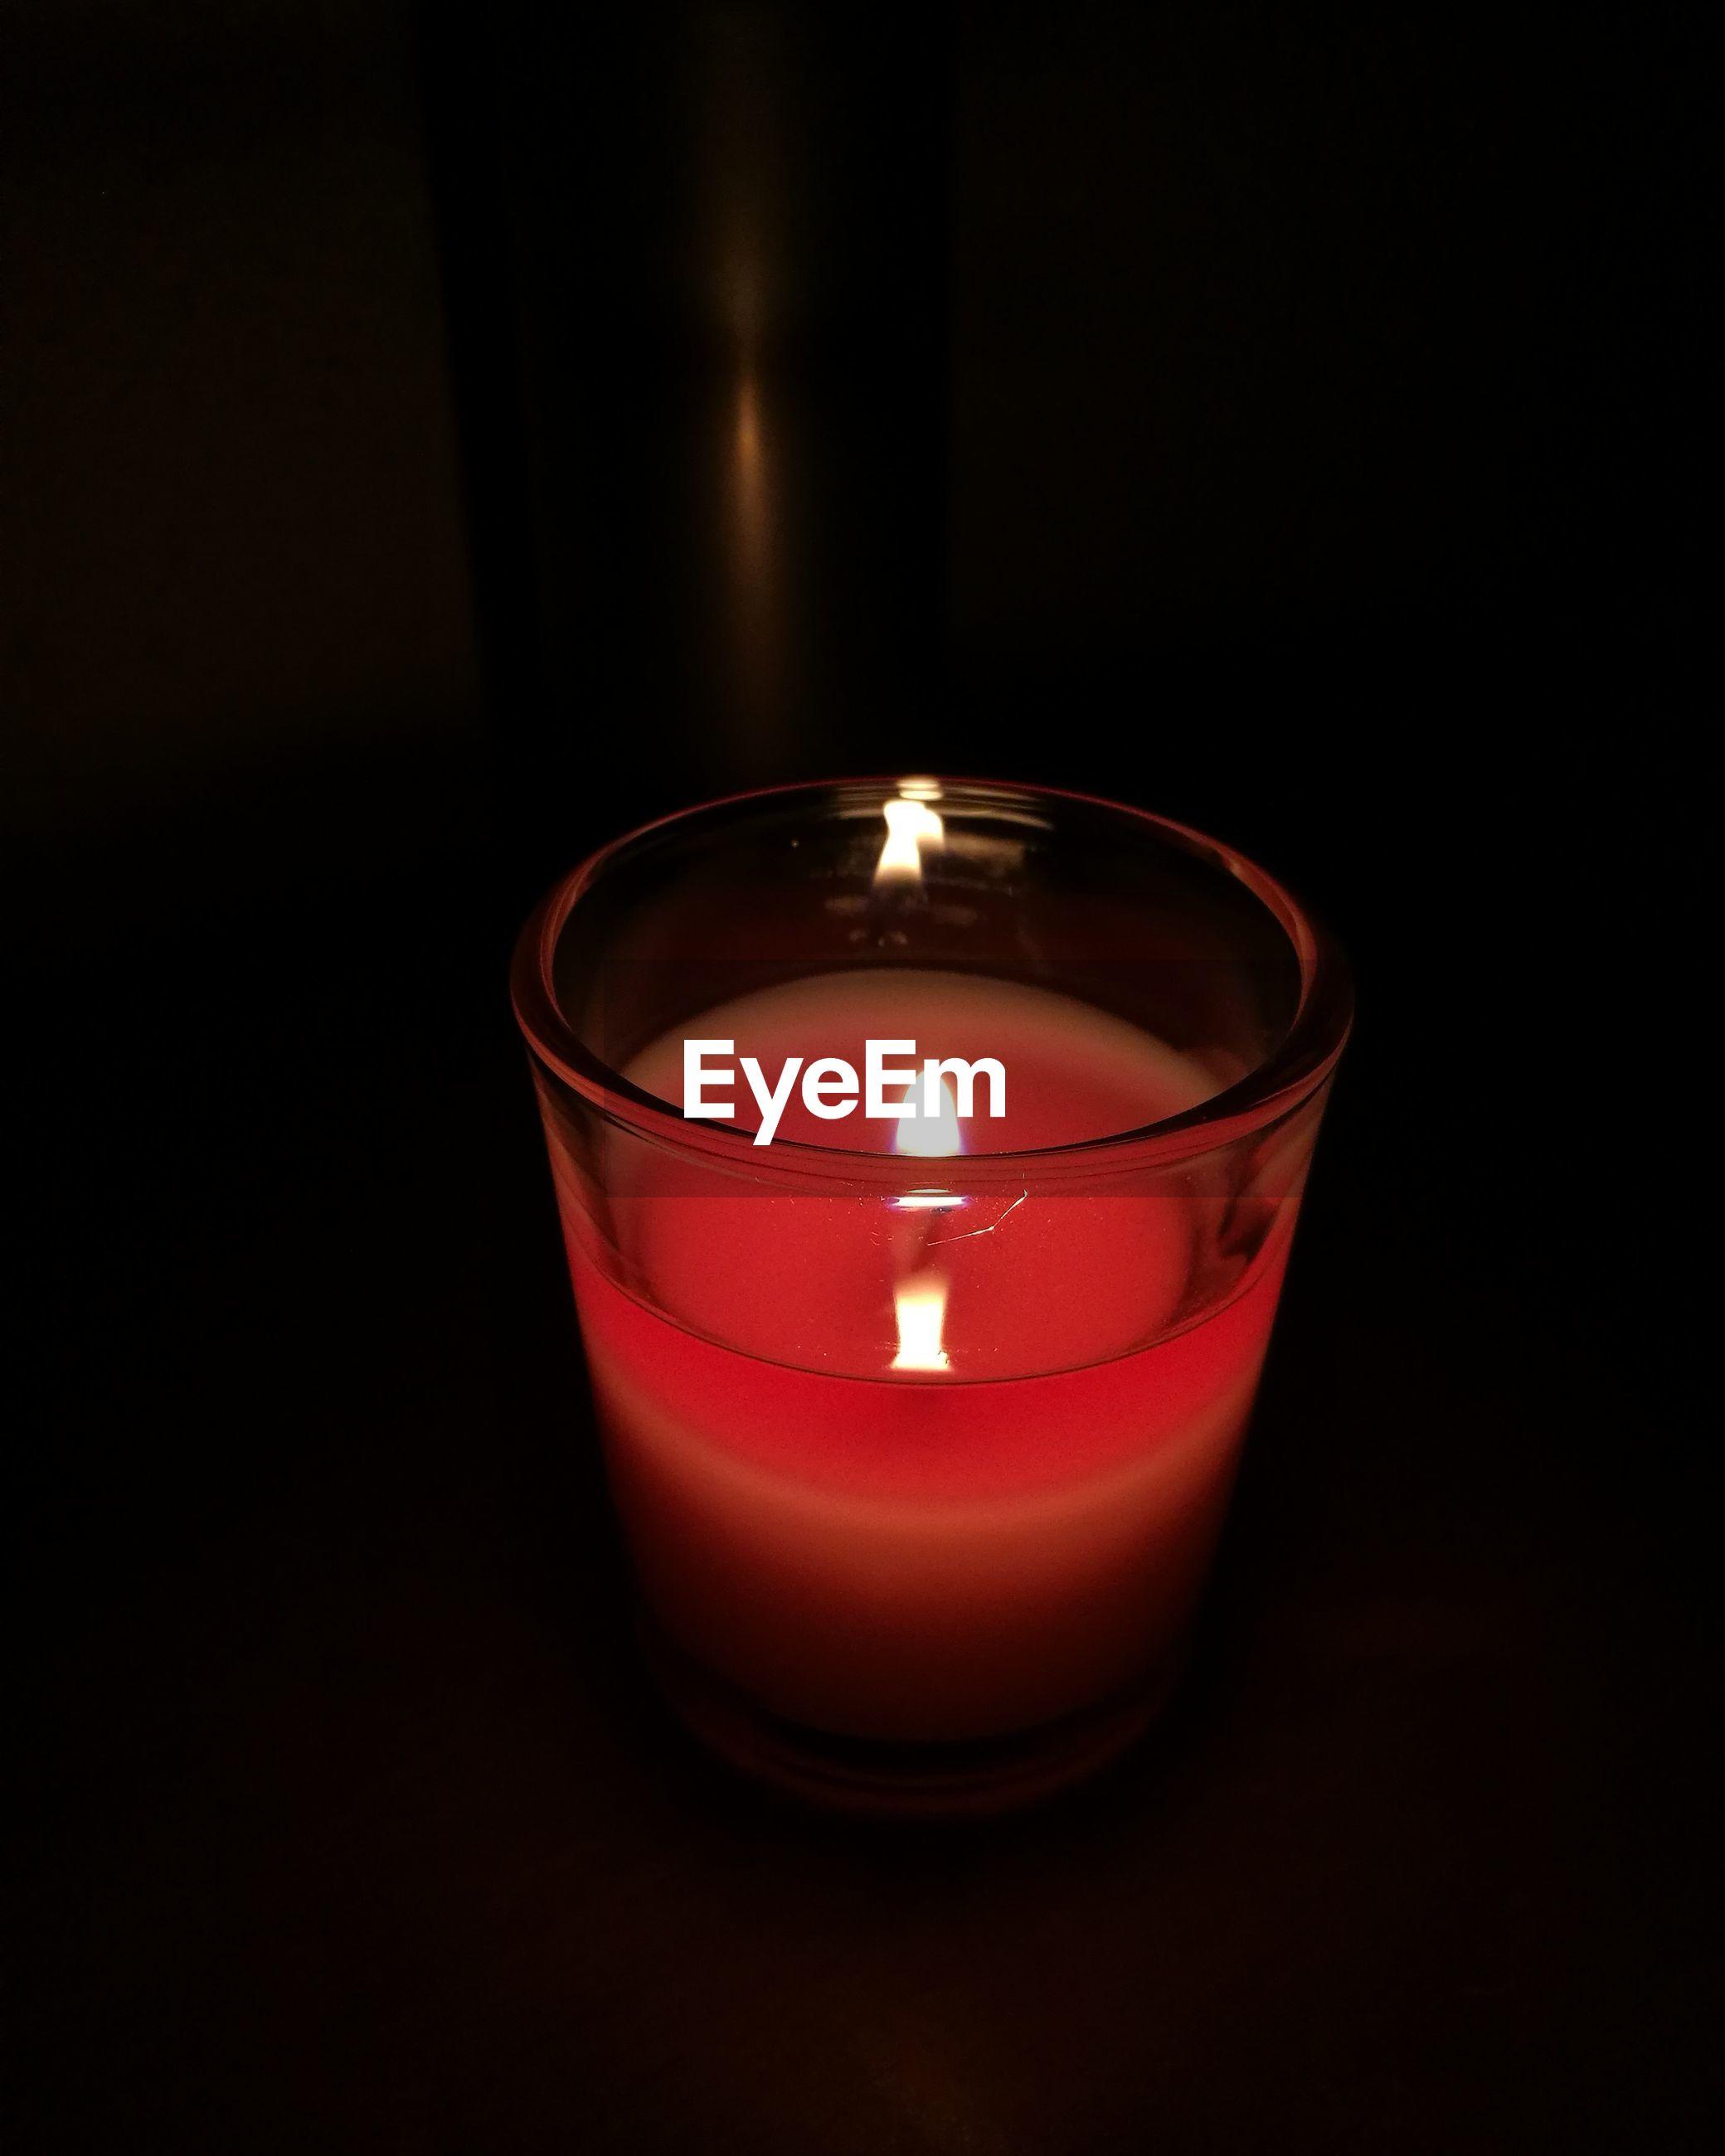 candle, flame, burning, heat - temperature, illuminated, darkroom, tea light, glowing, no people, lighting equipment, indoors, close-up, night, black background, diya - oil lamp